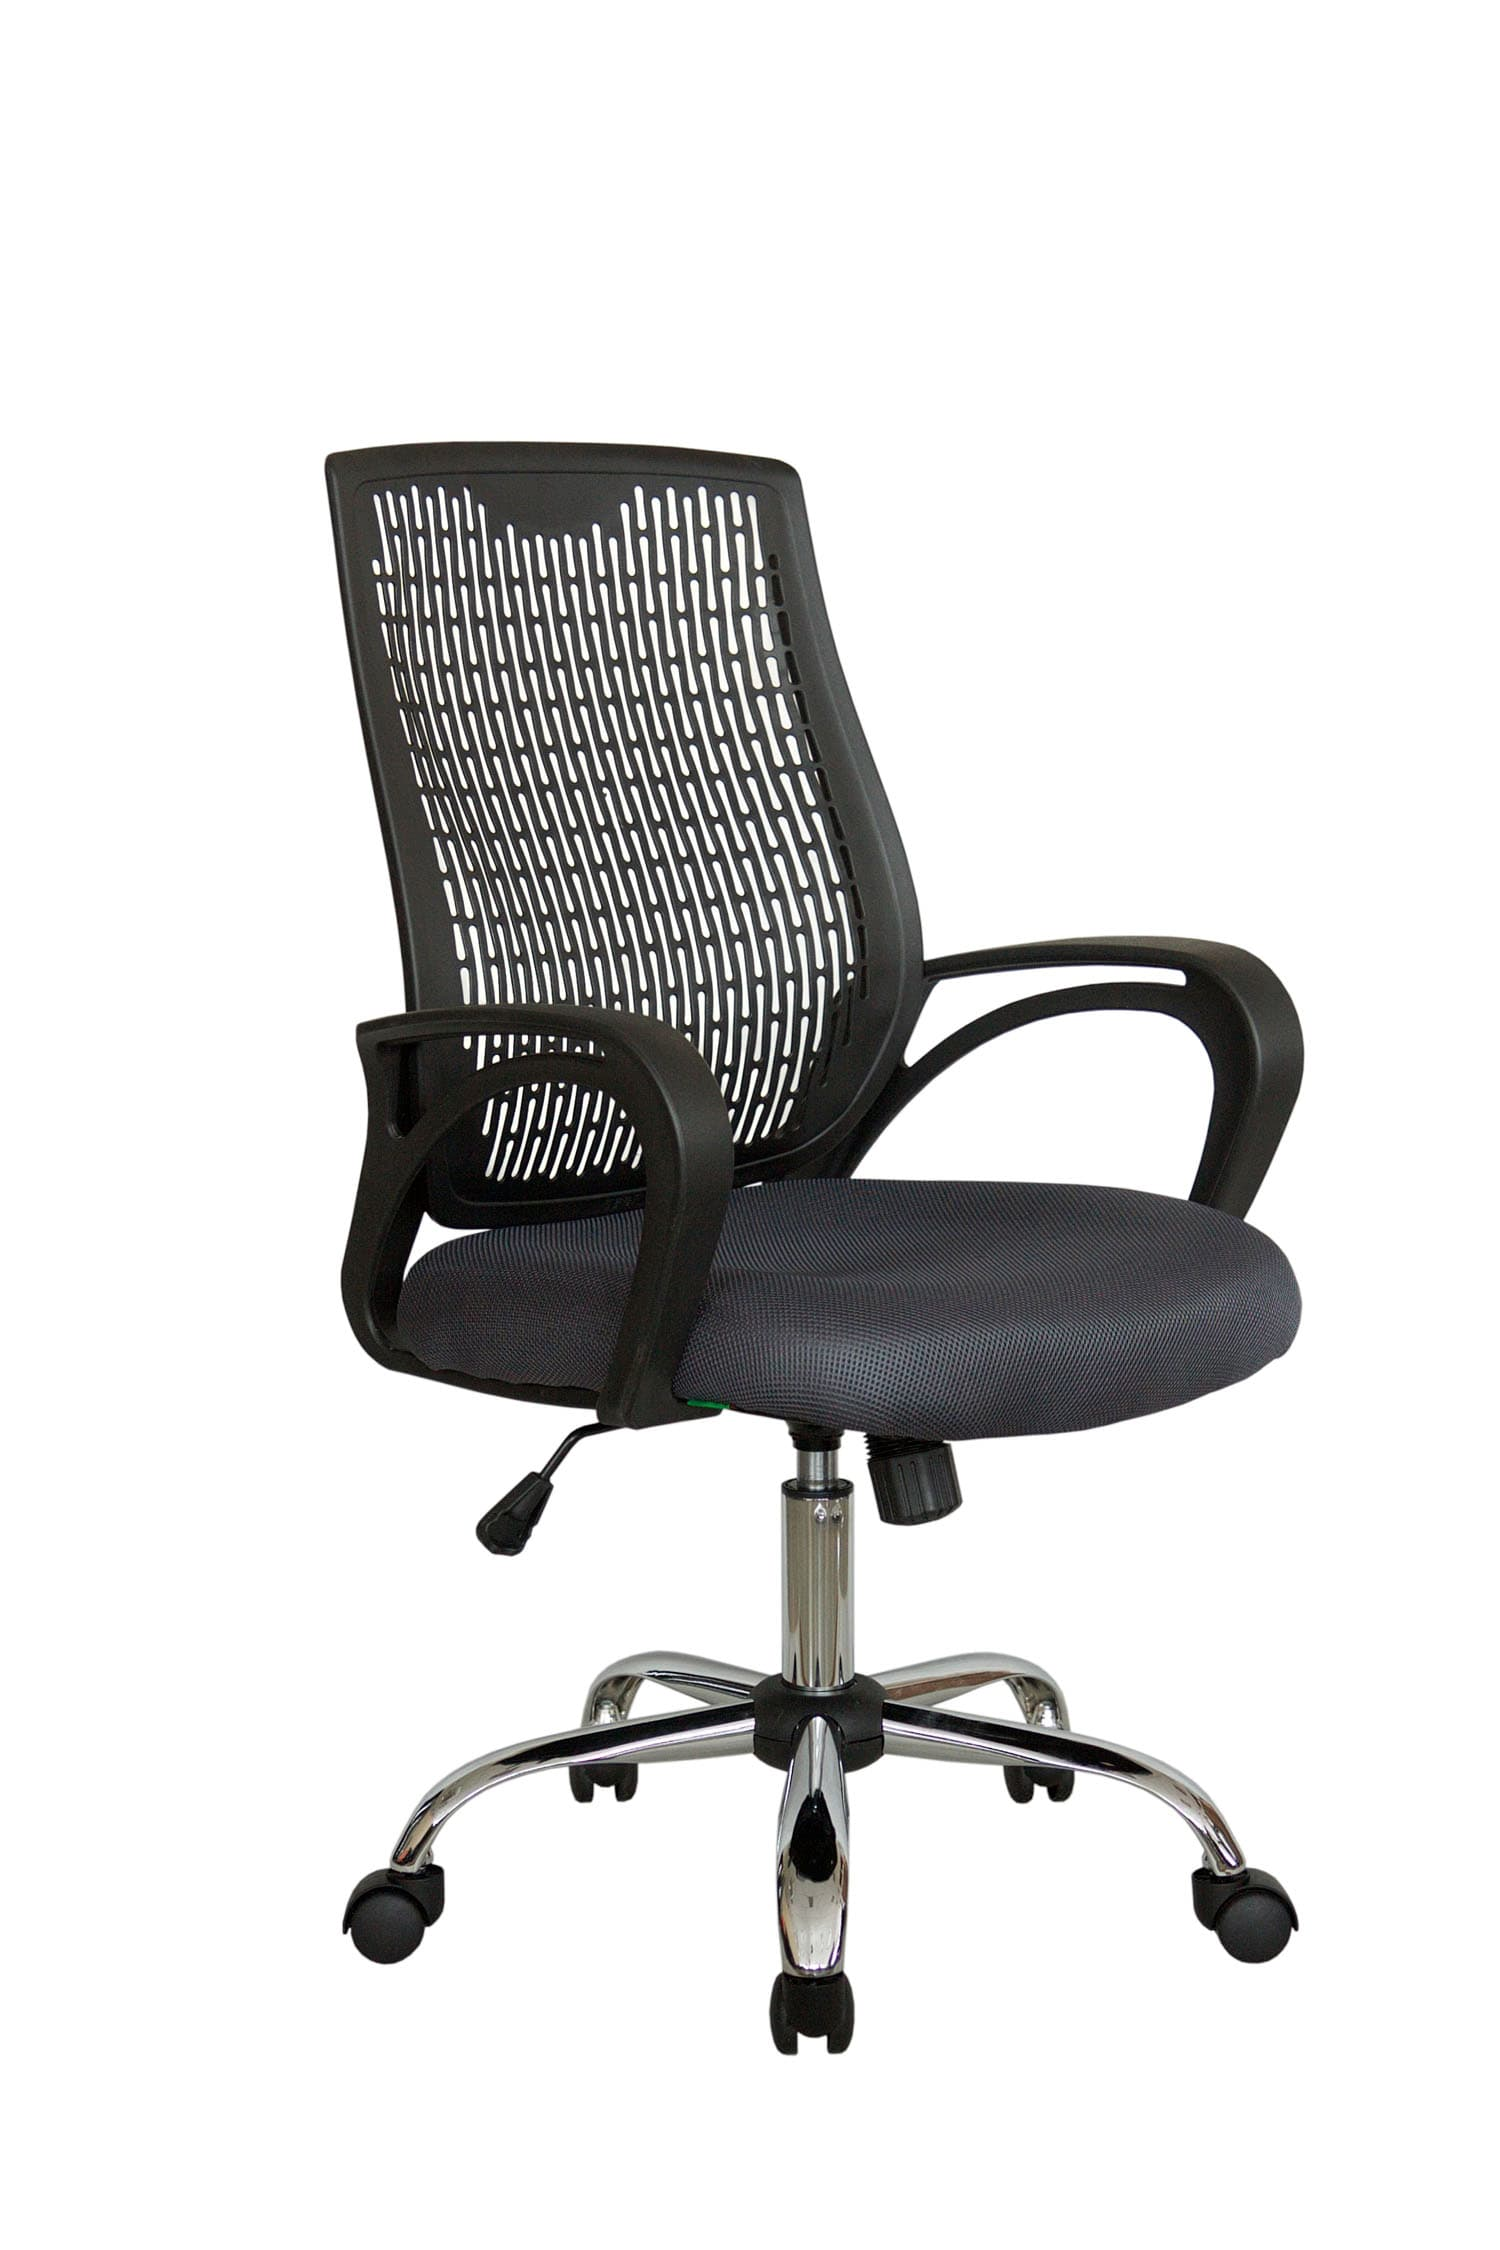 Кресло компьютерное Riva Chair 8081 Серый цвет, ткань/пластик